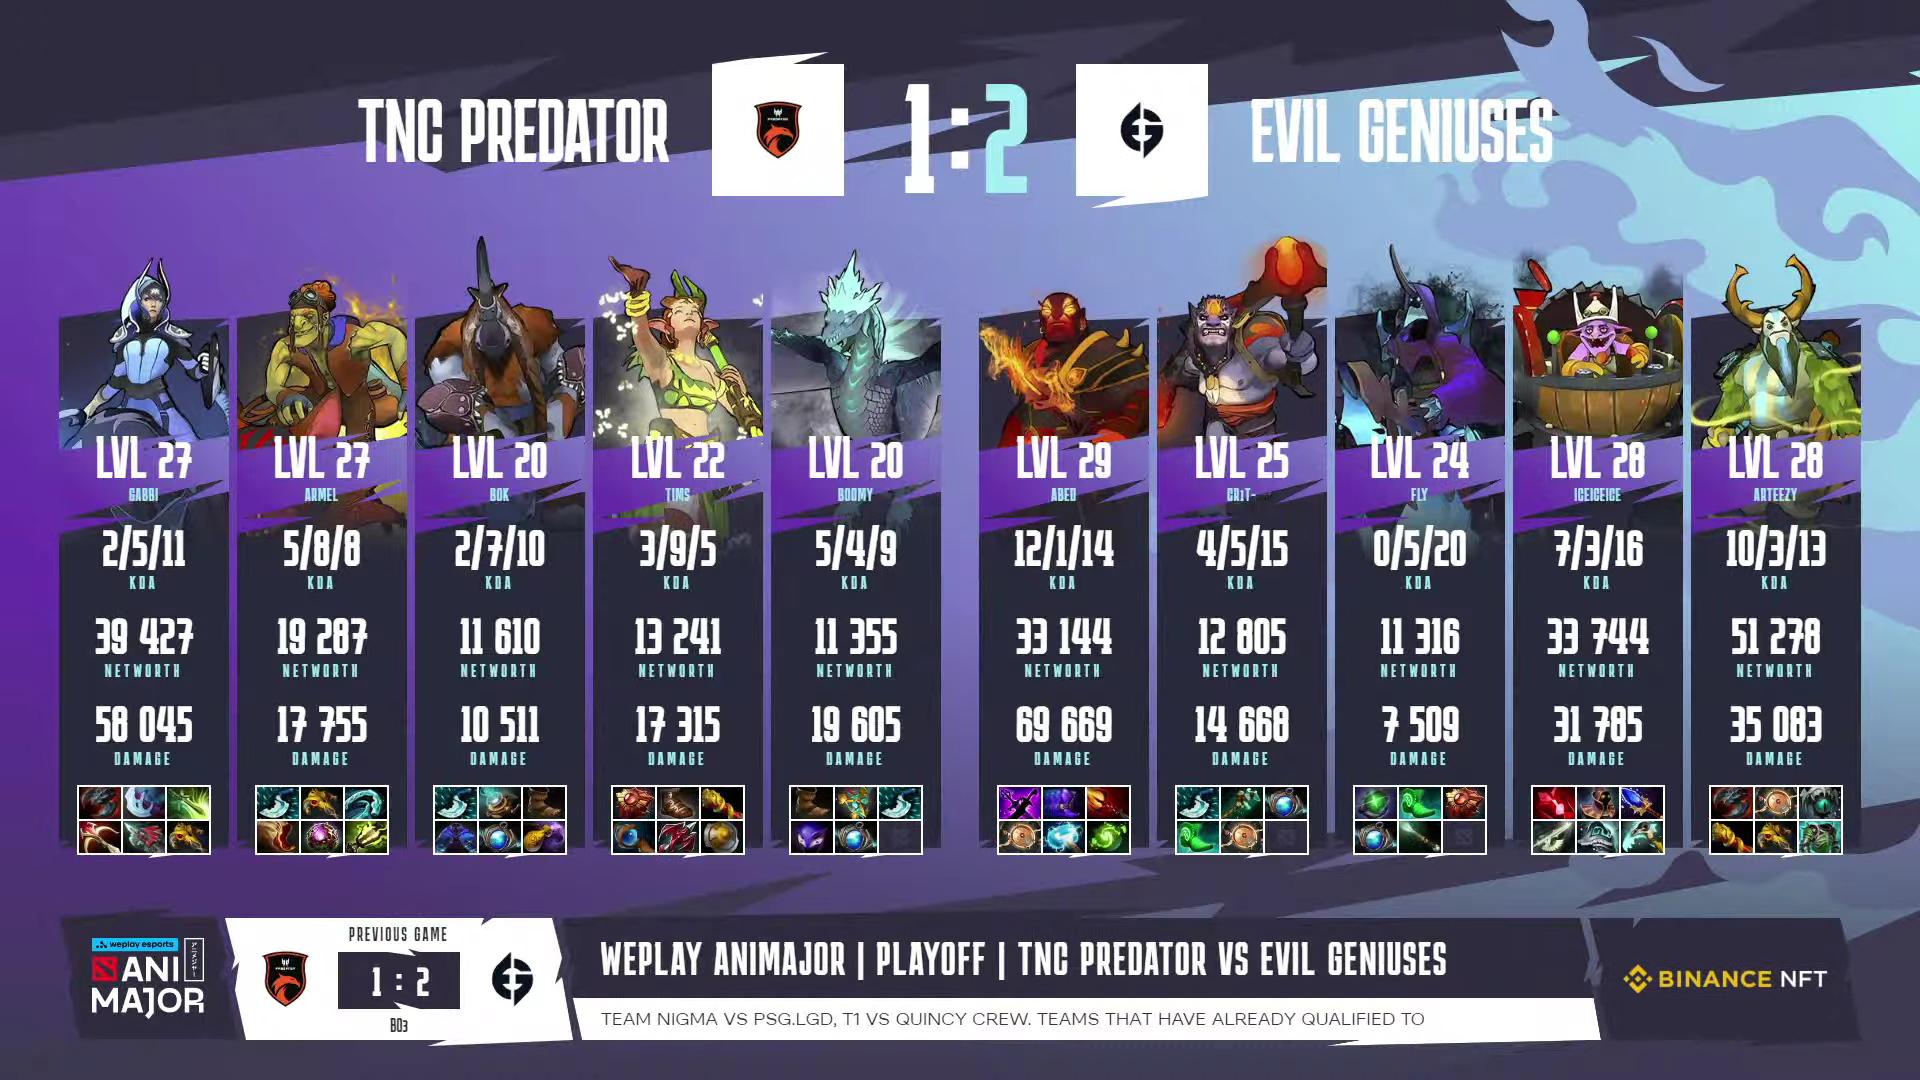 2021-AniMajor-Evil-Geniuses-def-TNC-Game-3 Abed knocks out TNC's AniMajor hopes DOTA 2 ESports News  - philippine sports news